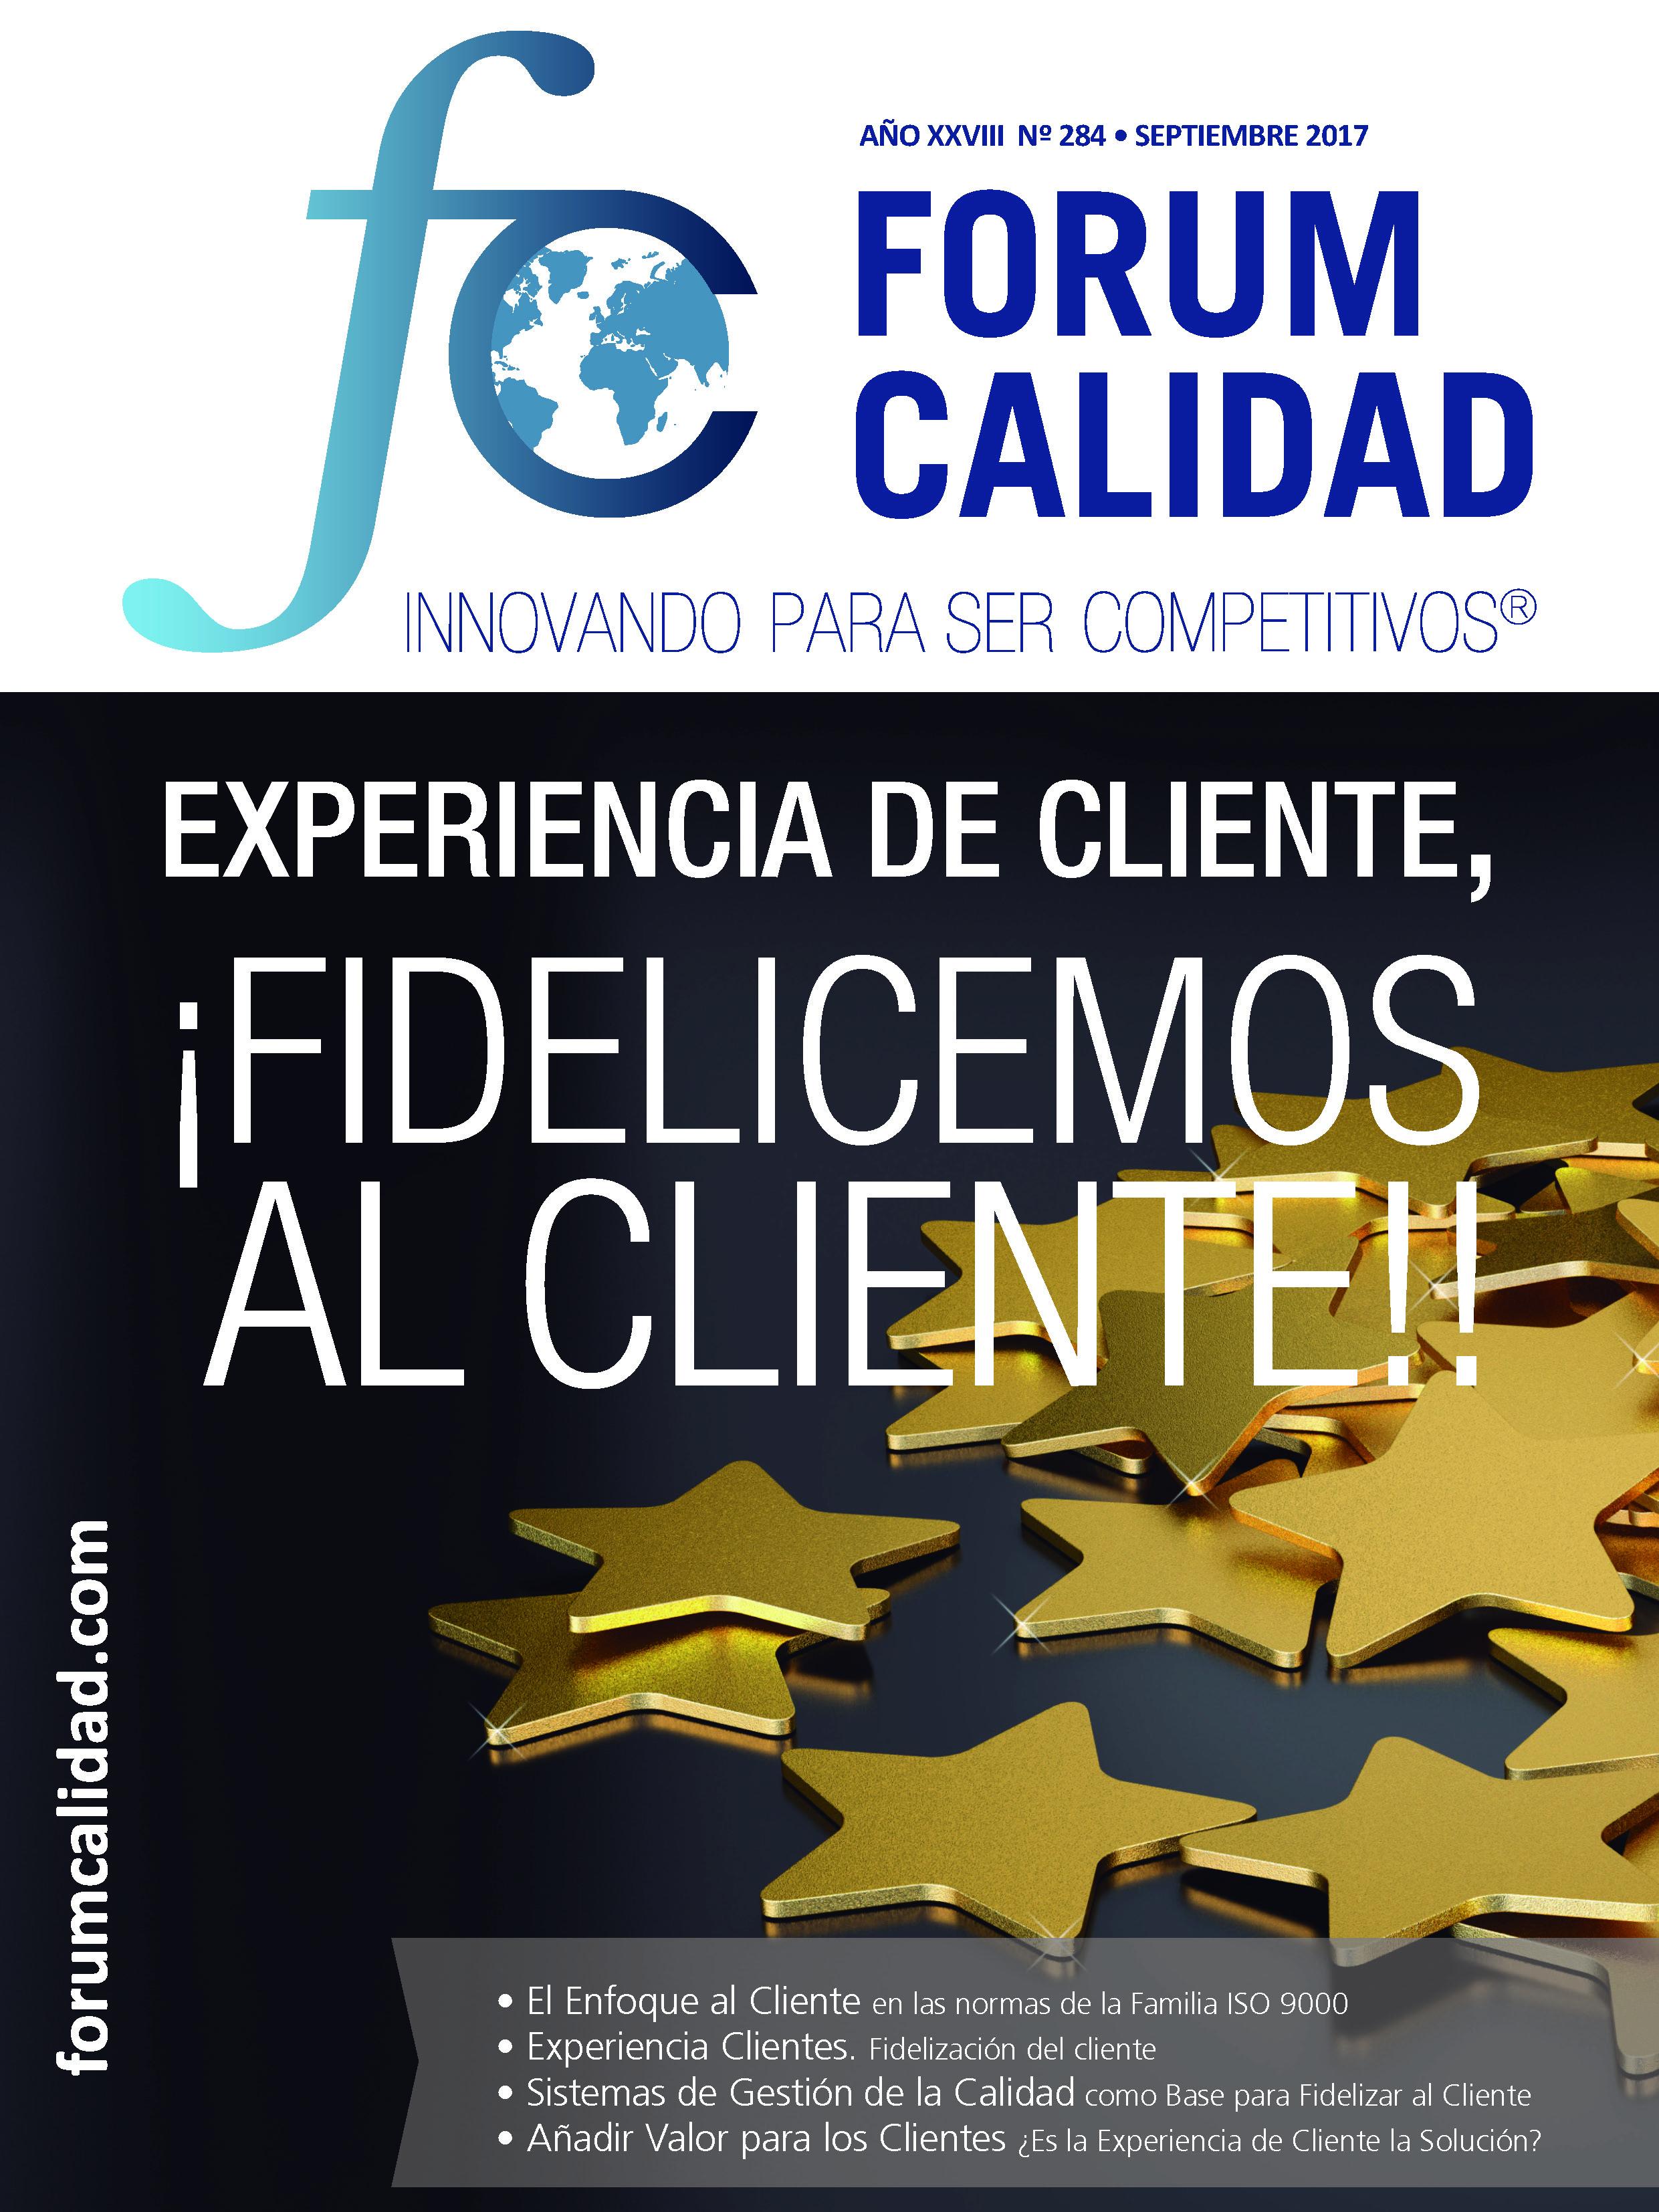 Forum Calidad nº 284 Septiembre 2017